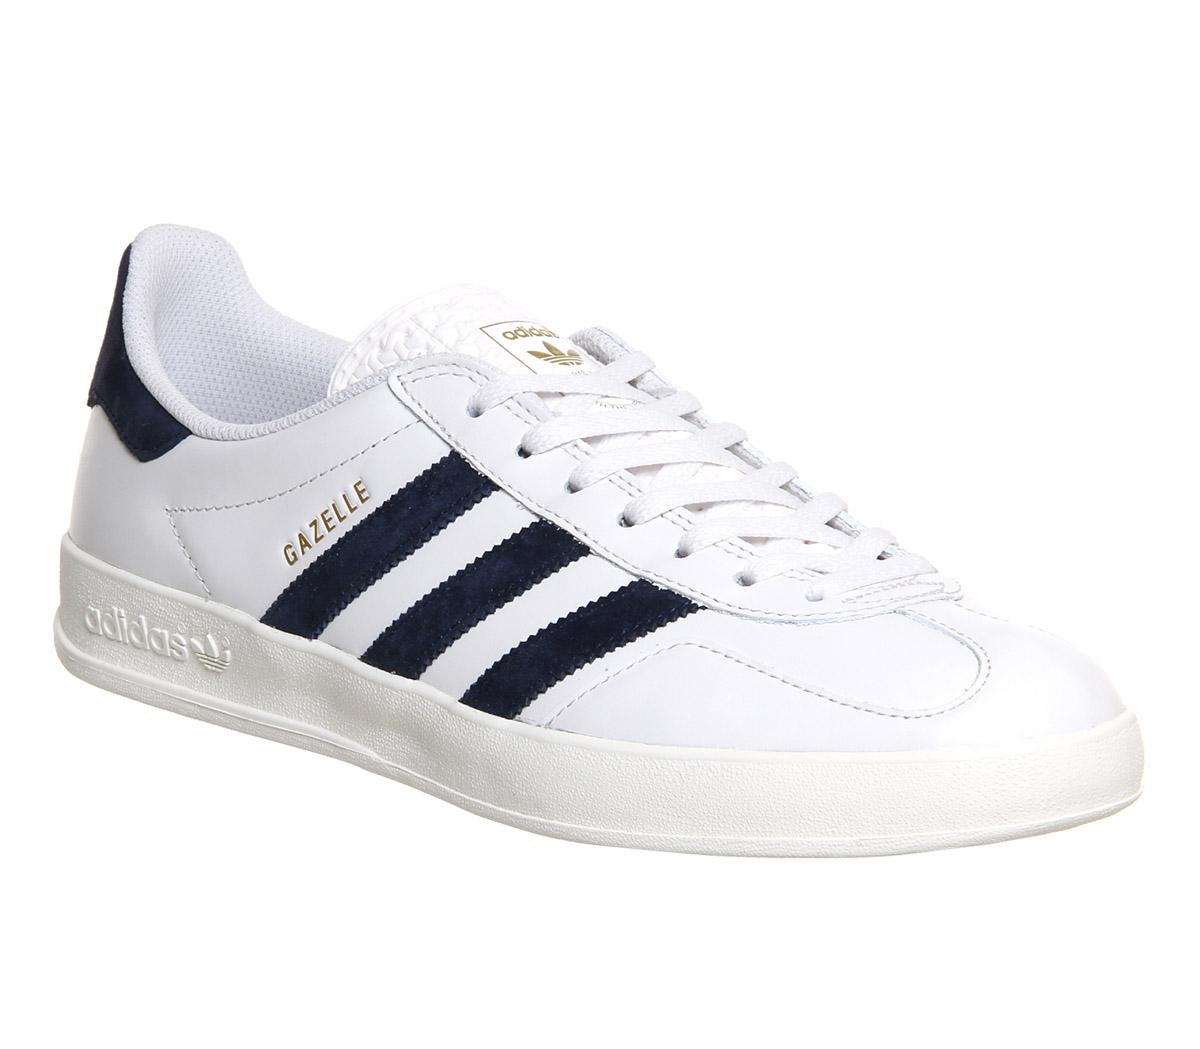 adidas gazelles adidas-gazelle-indoor-vintage-white-leather-exclusive-trainers- VTYMWJC